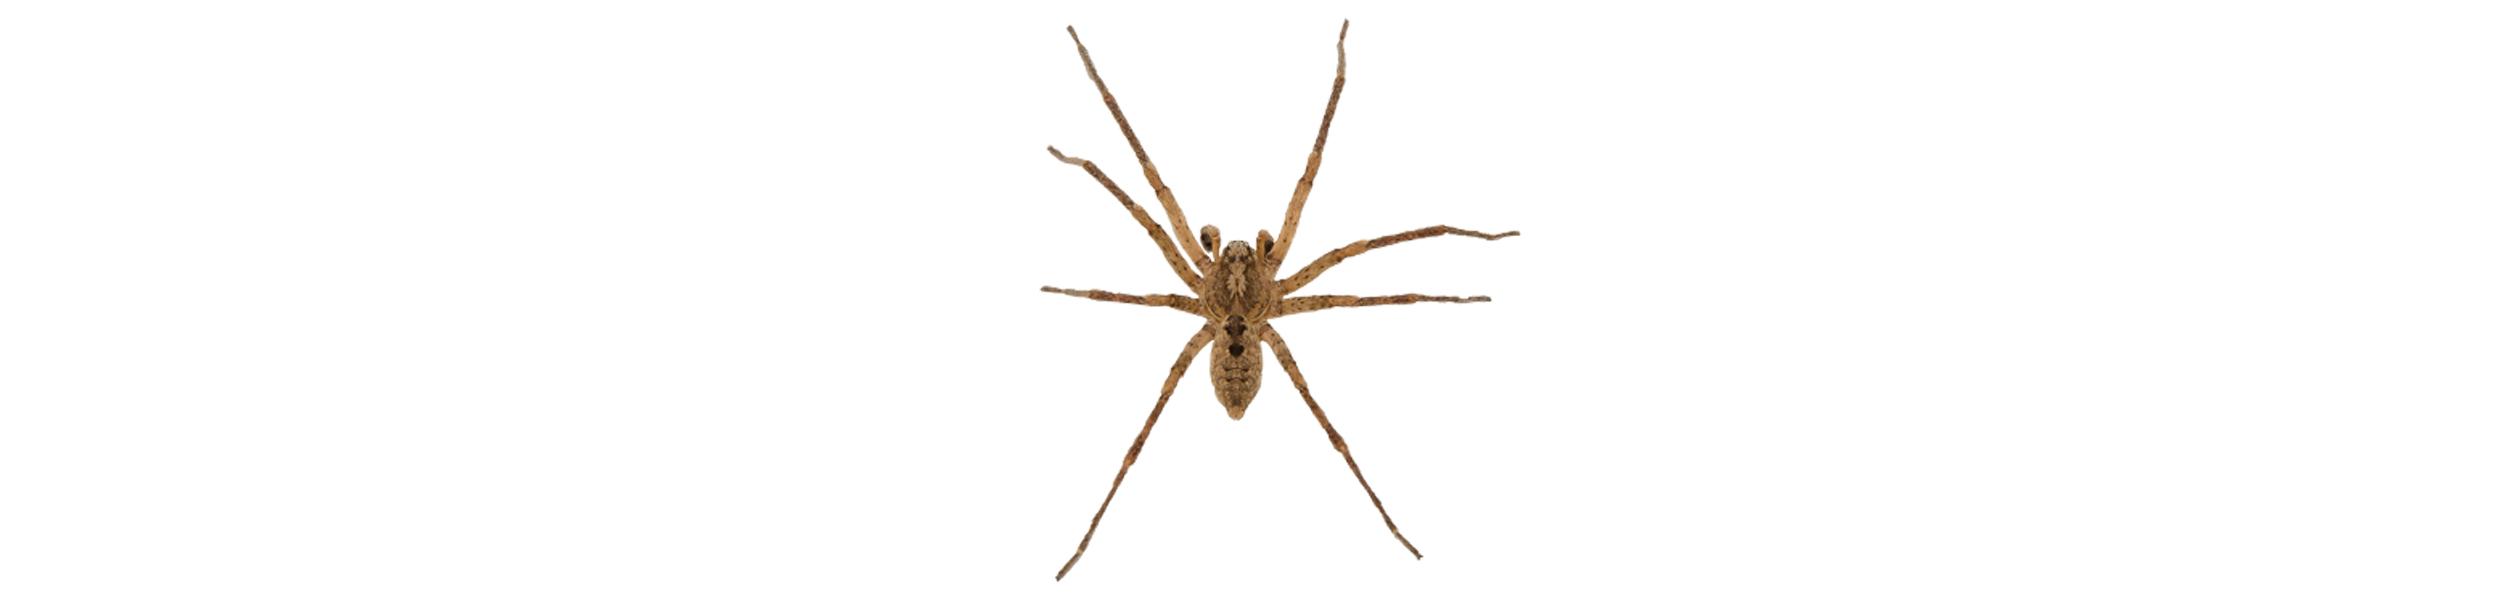 Brown-Resluce-Spider-BEFORE